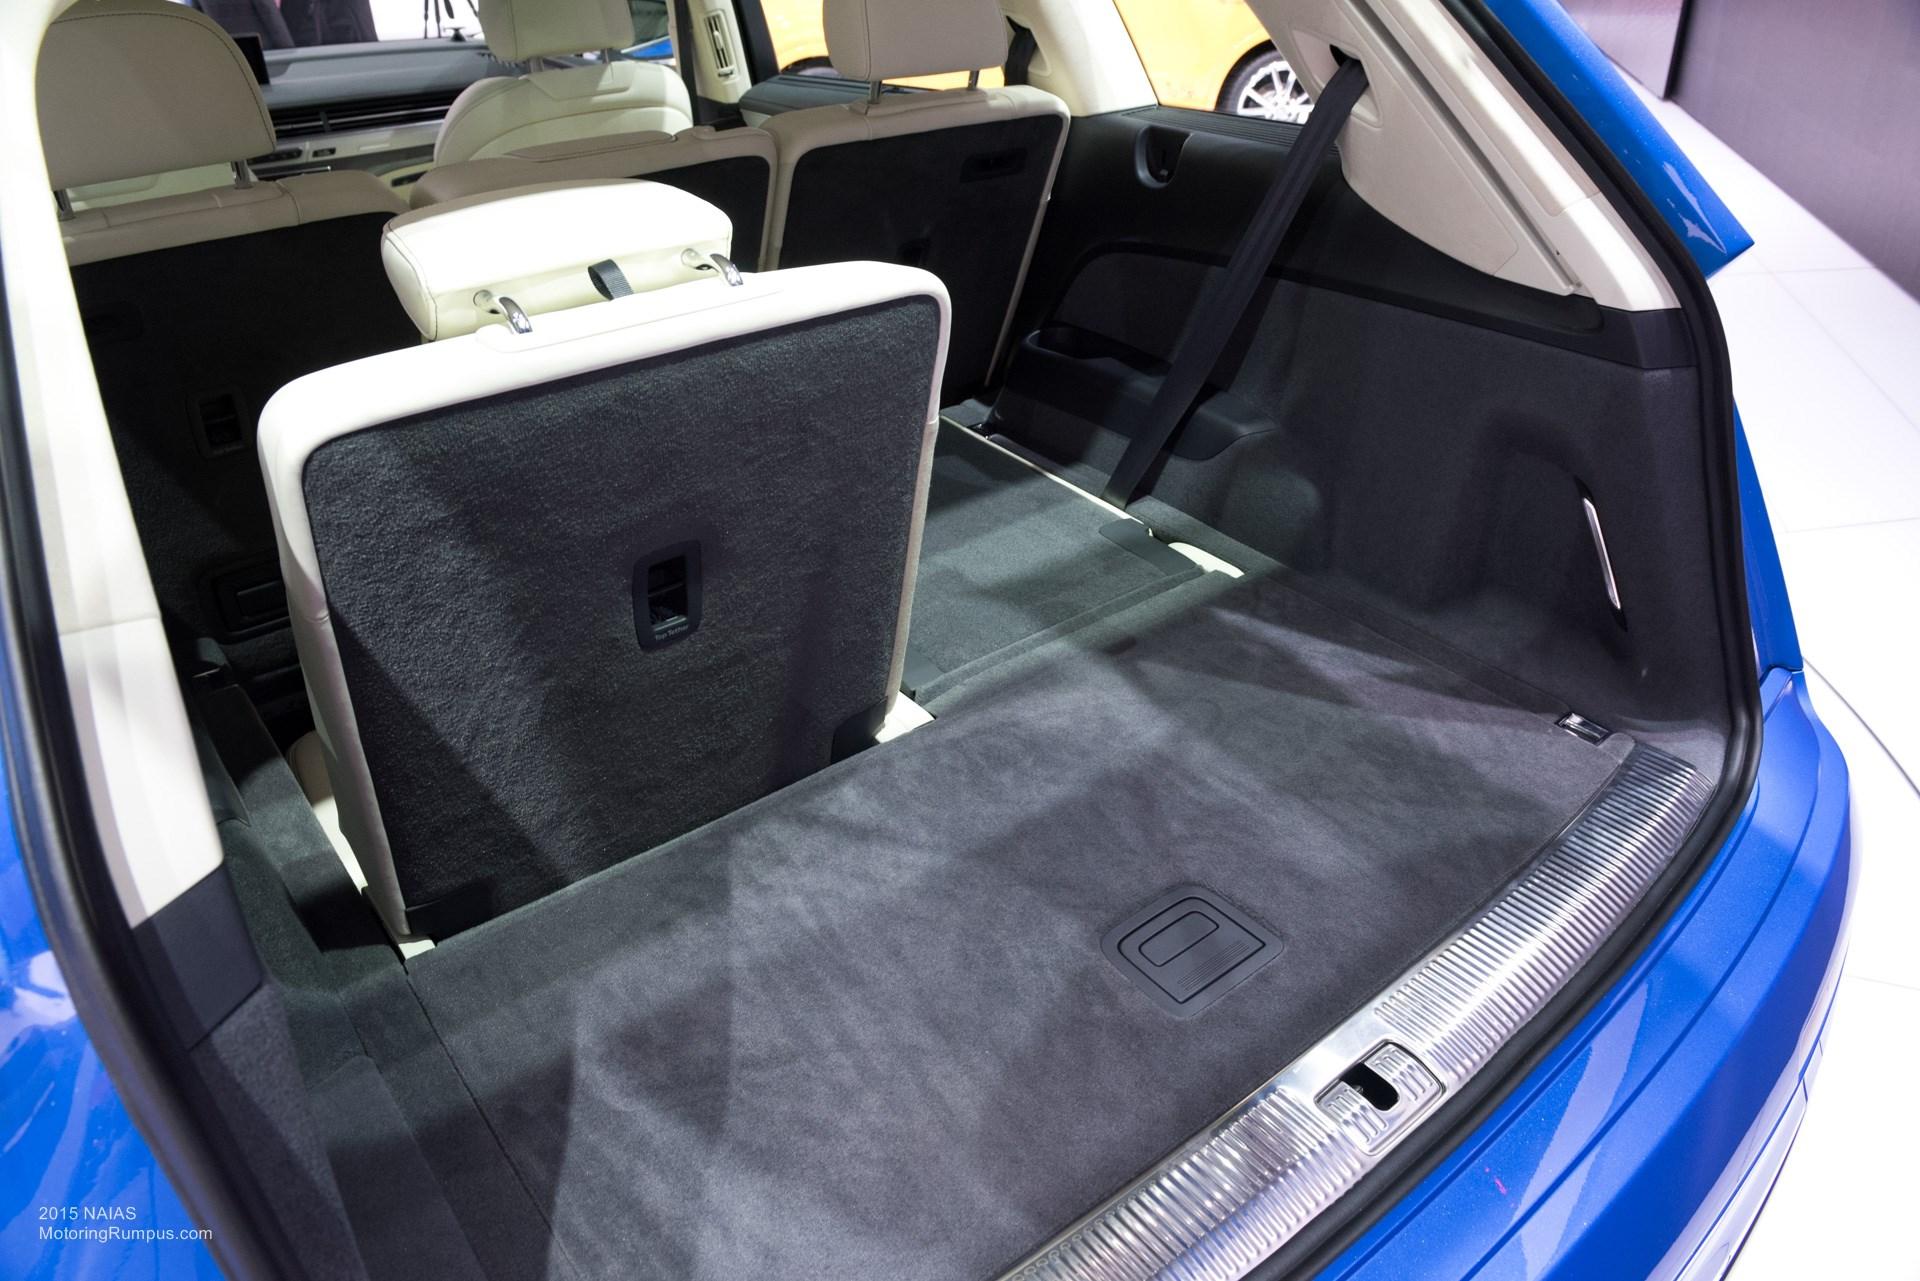 2015 NAIAS Audi Q7 Third Row Seats